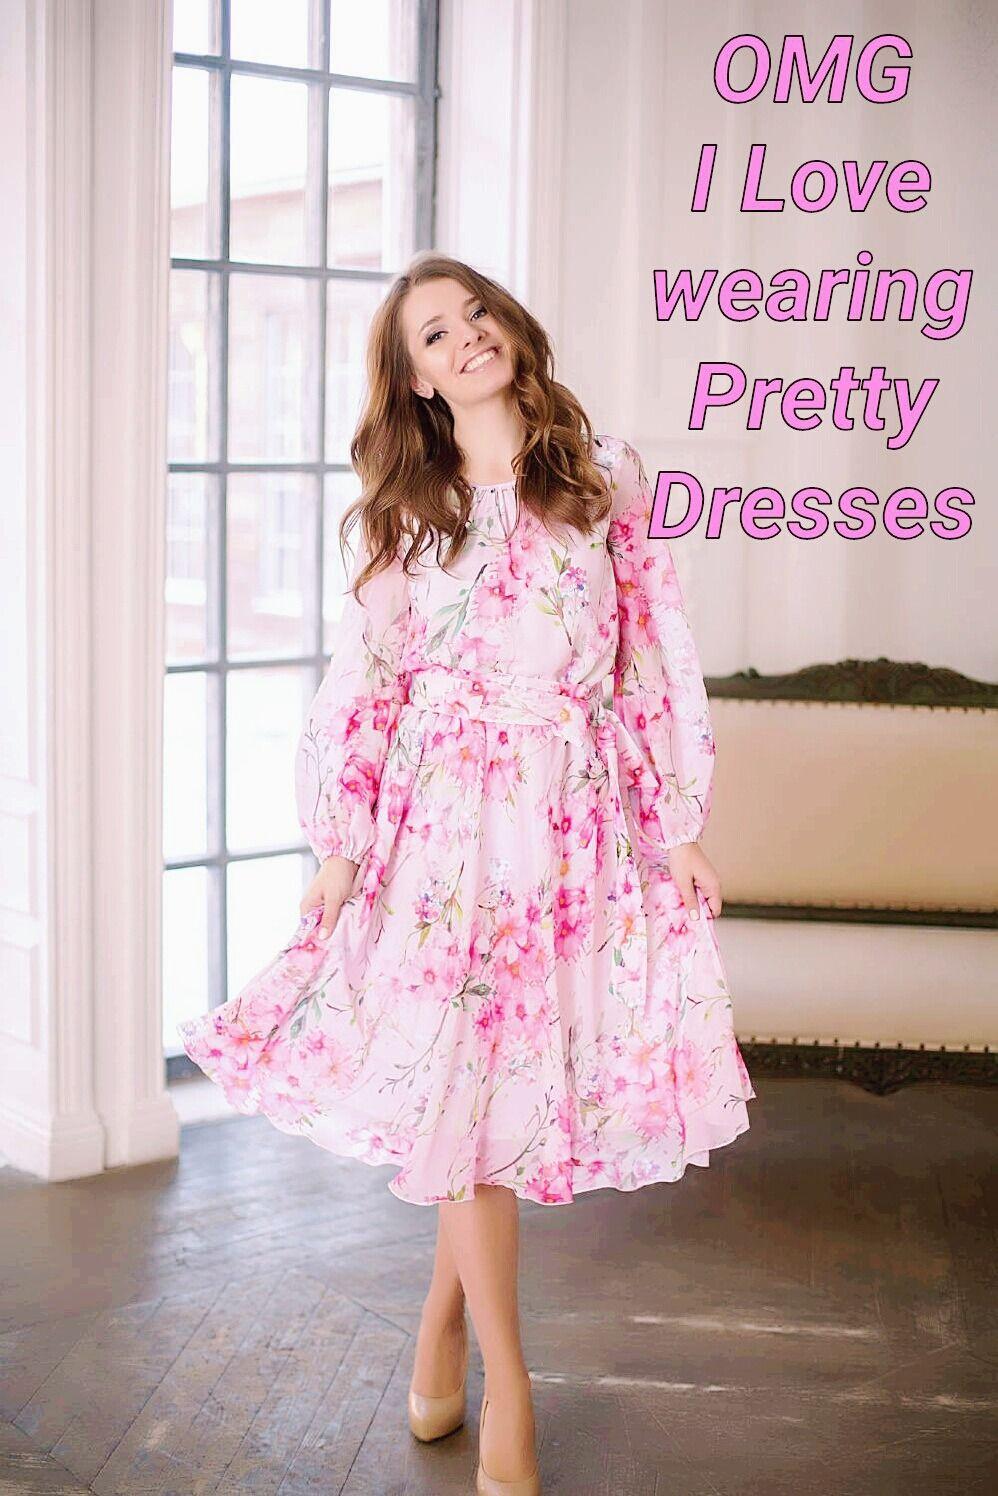 LouiseLonging | Feminine Dreams and desires | Pinterest | Captions ...